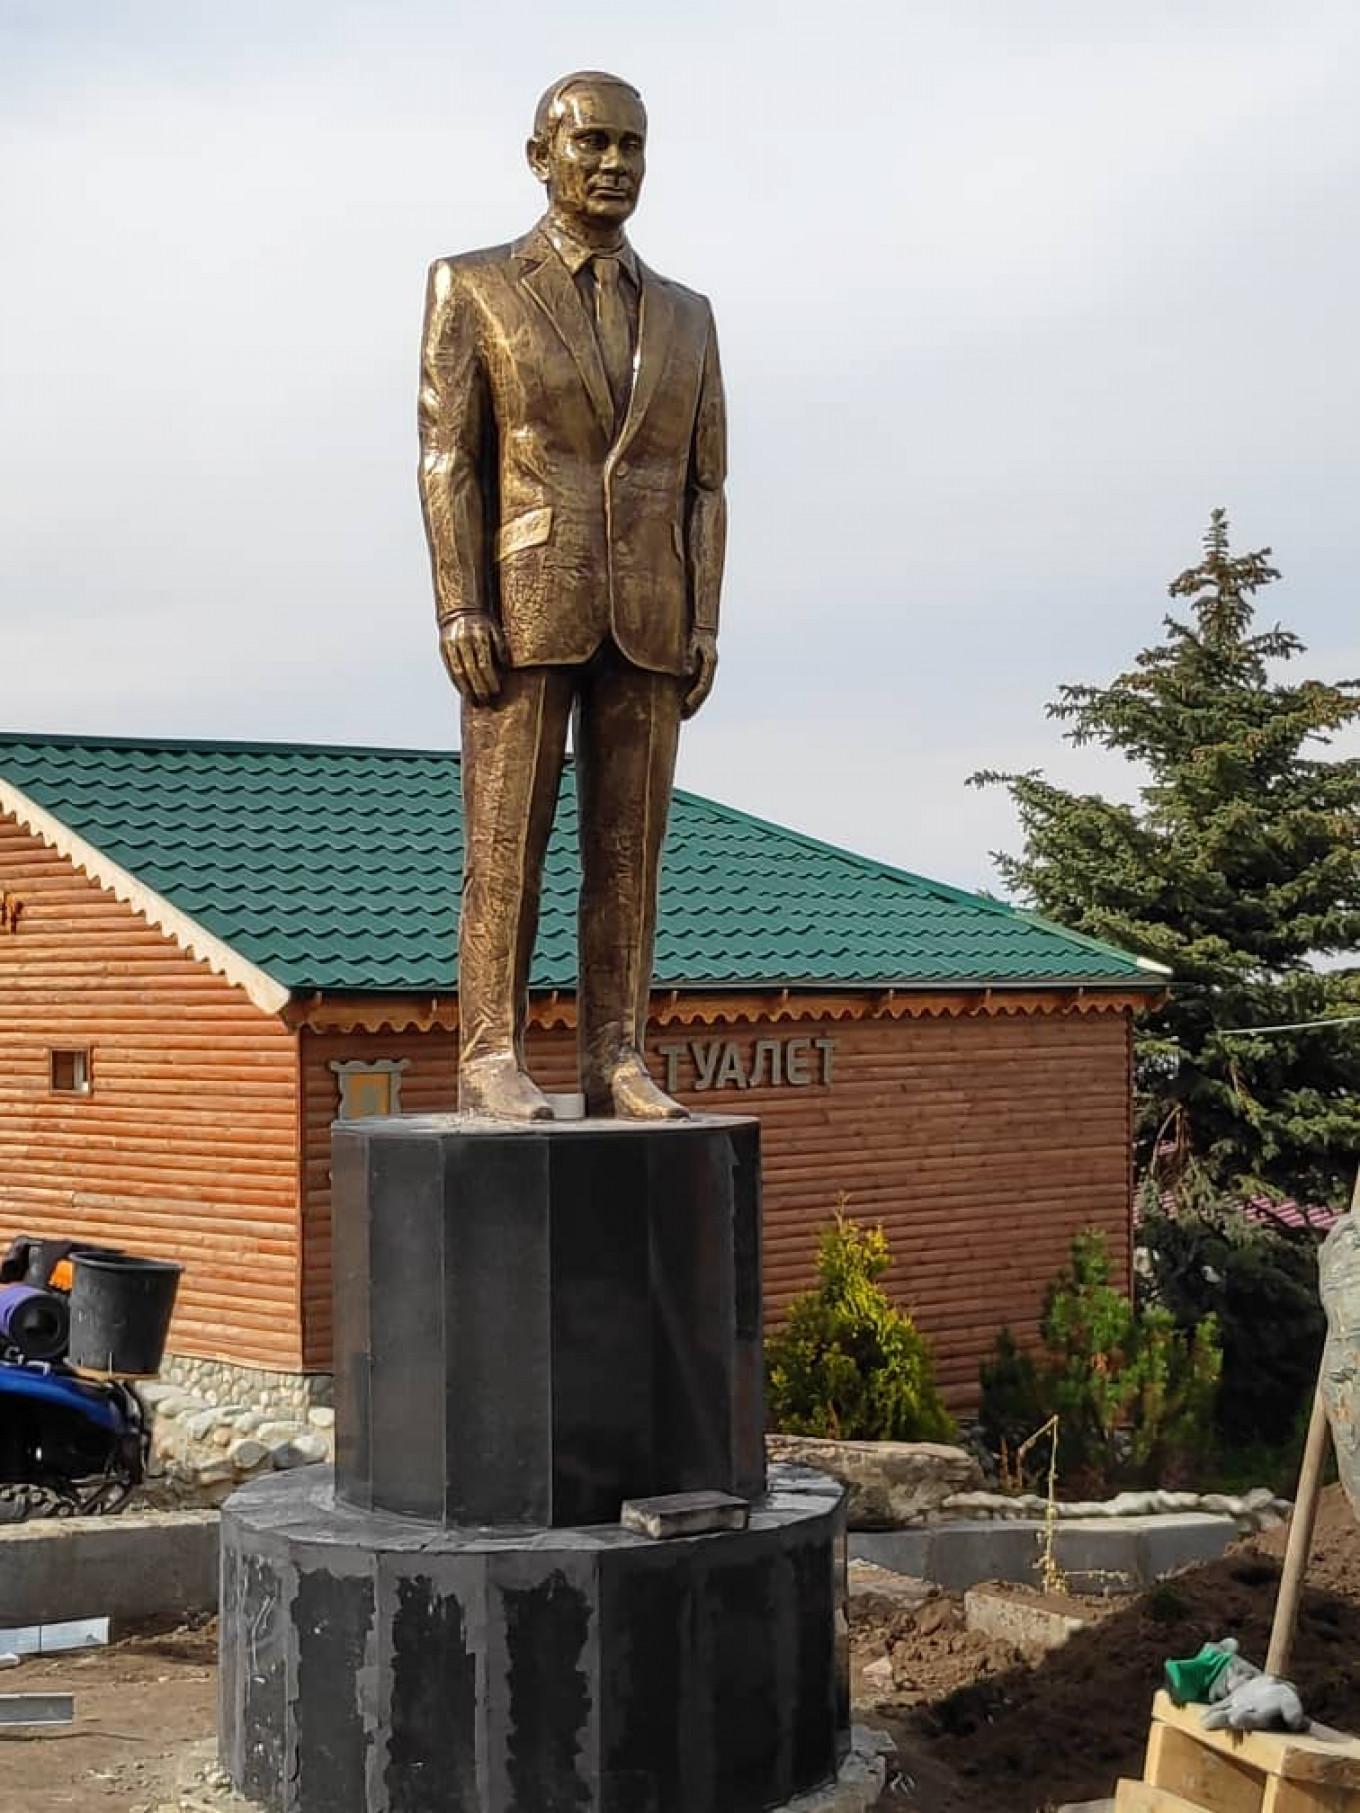 Image result for Kyrgyzstan Ski Resort Unveils $1.2 Million Vladimir Putin Statue: 'I Didn't Know How to Express My Gratitude'